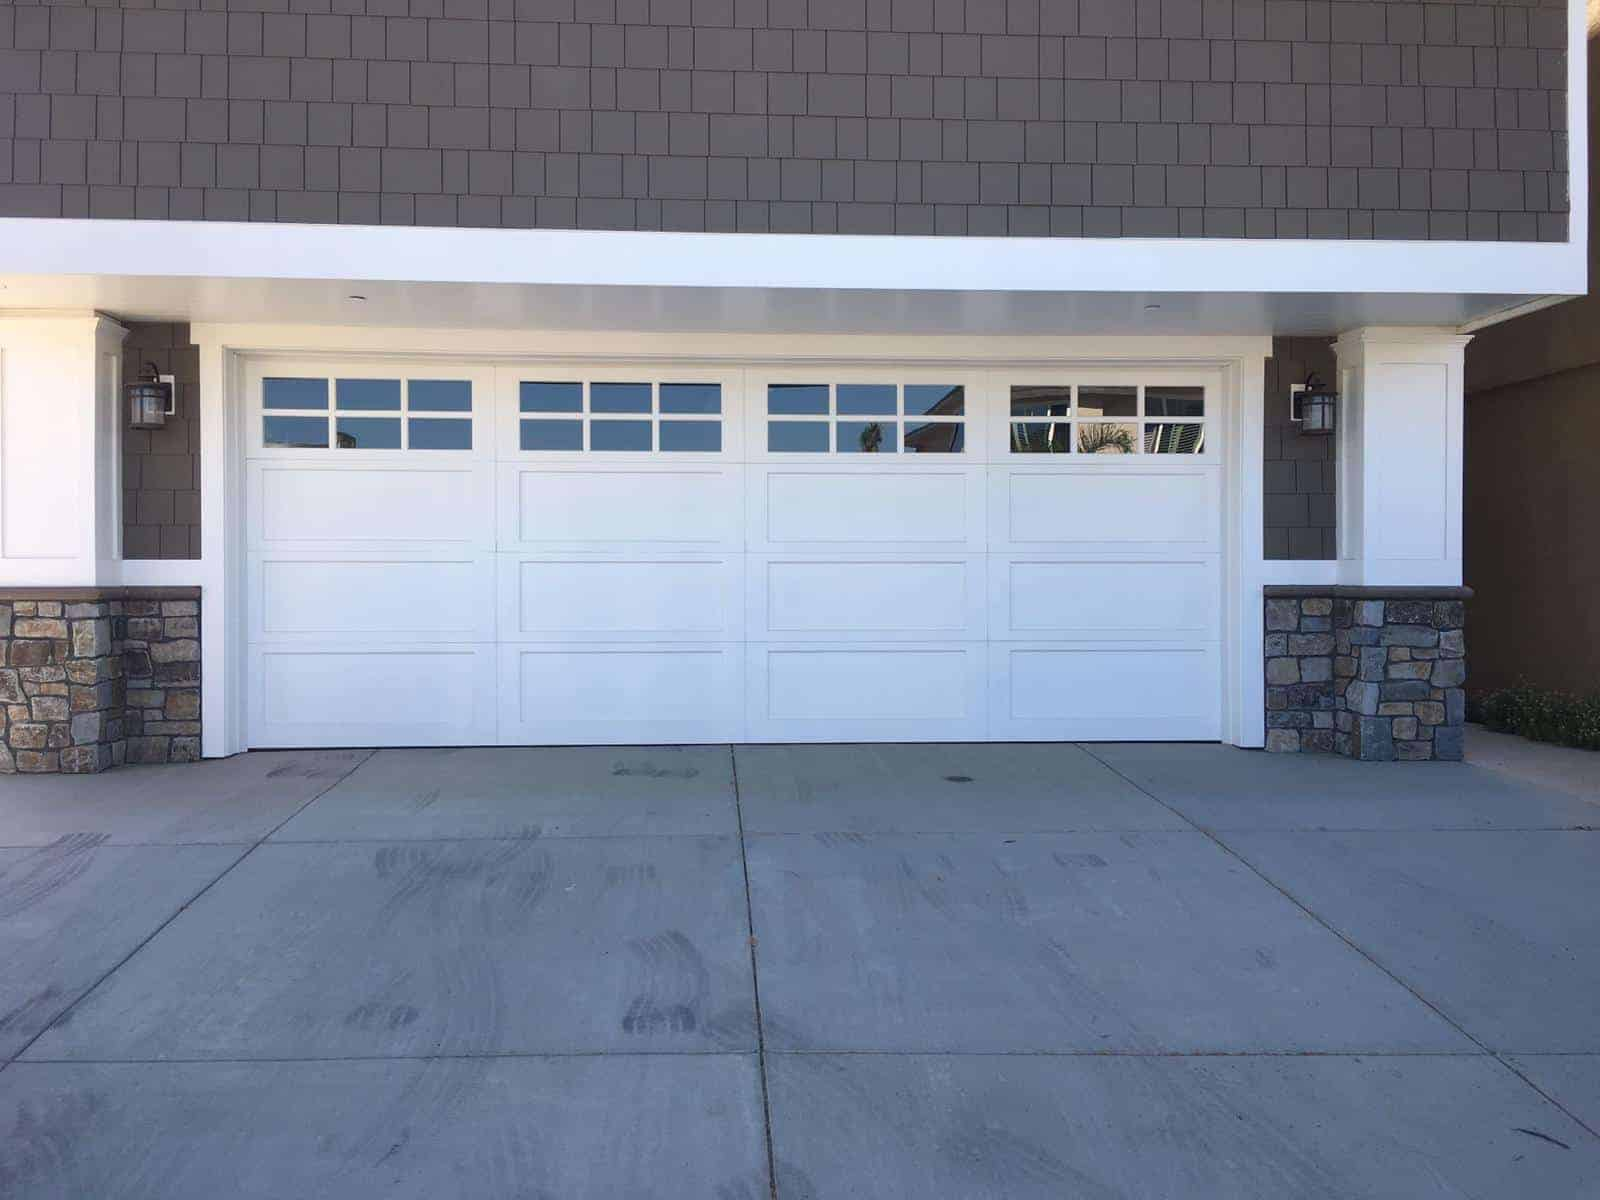 Rio Oso CA Garage Door Repair & Replacement